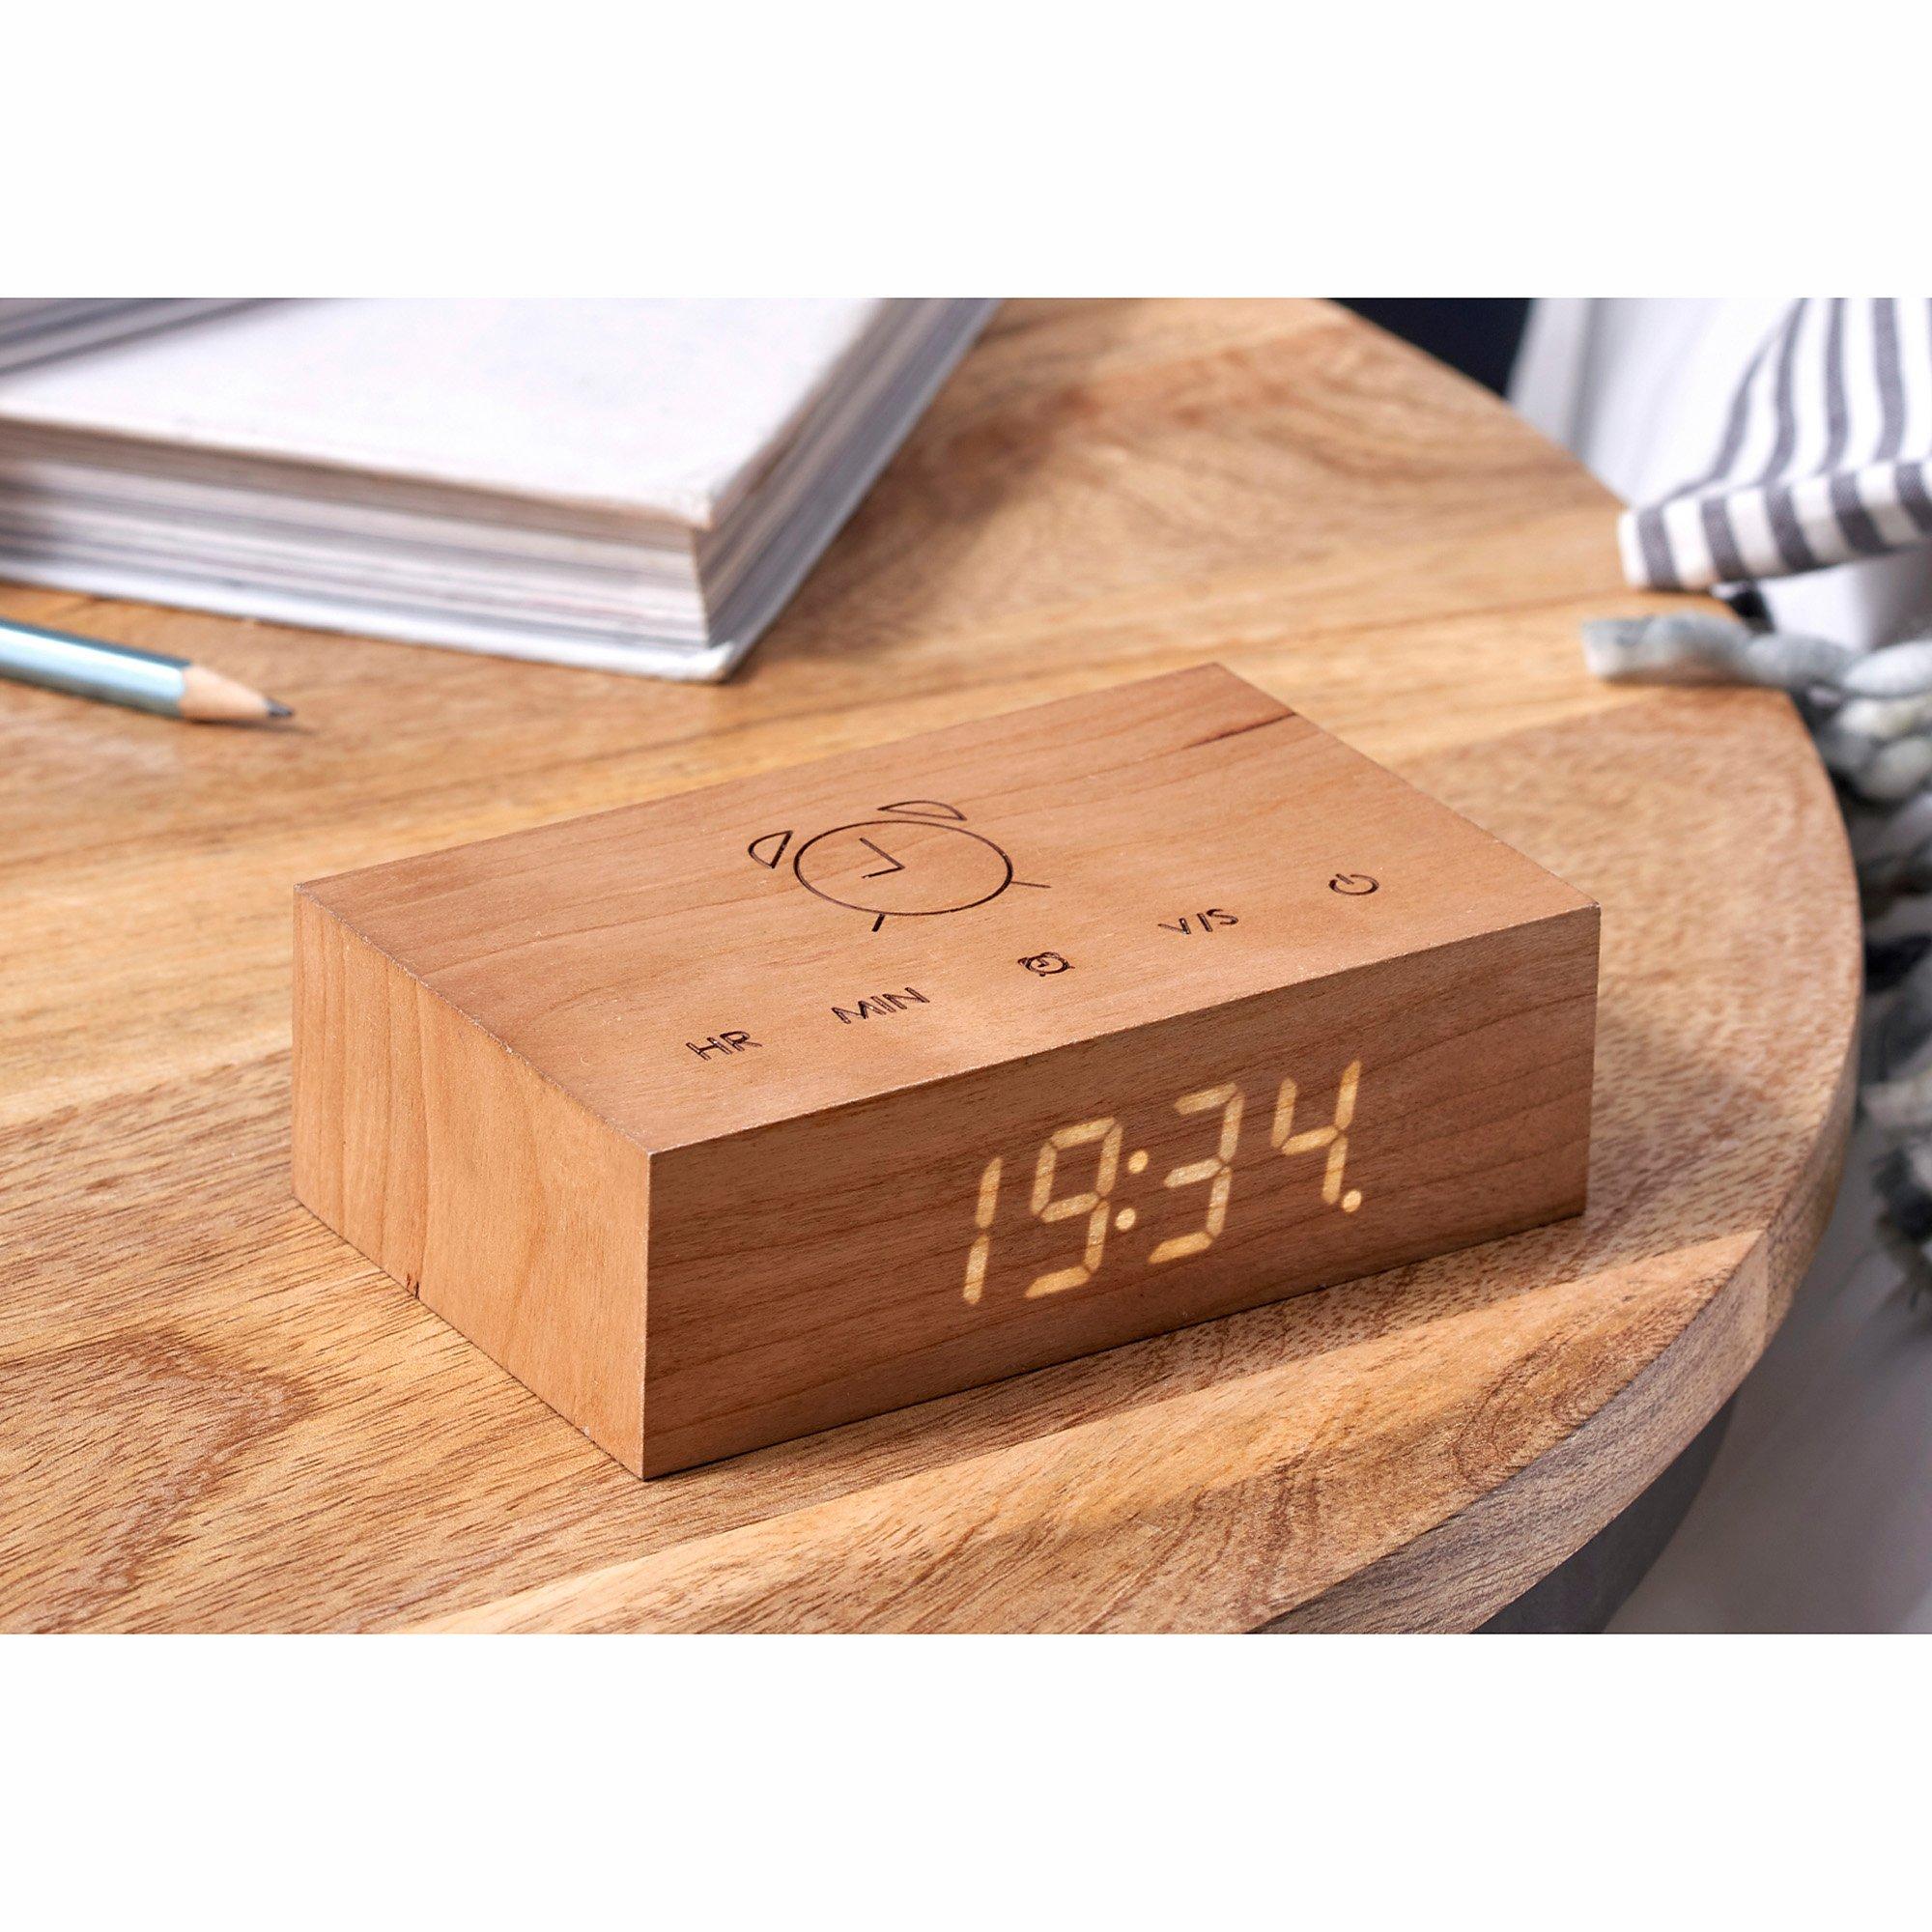 Gingko Flip Click Clock SALE 25% (£39.95)